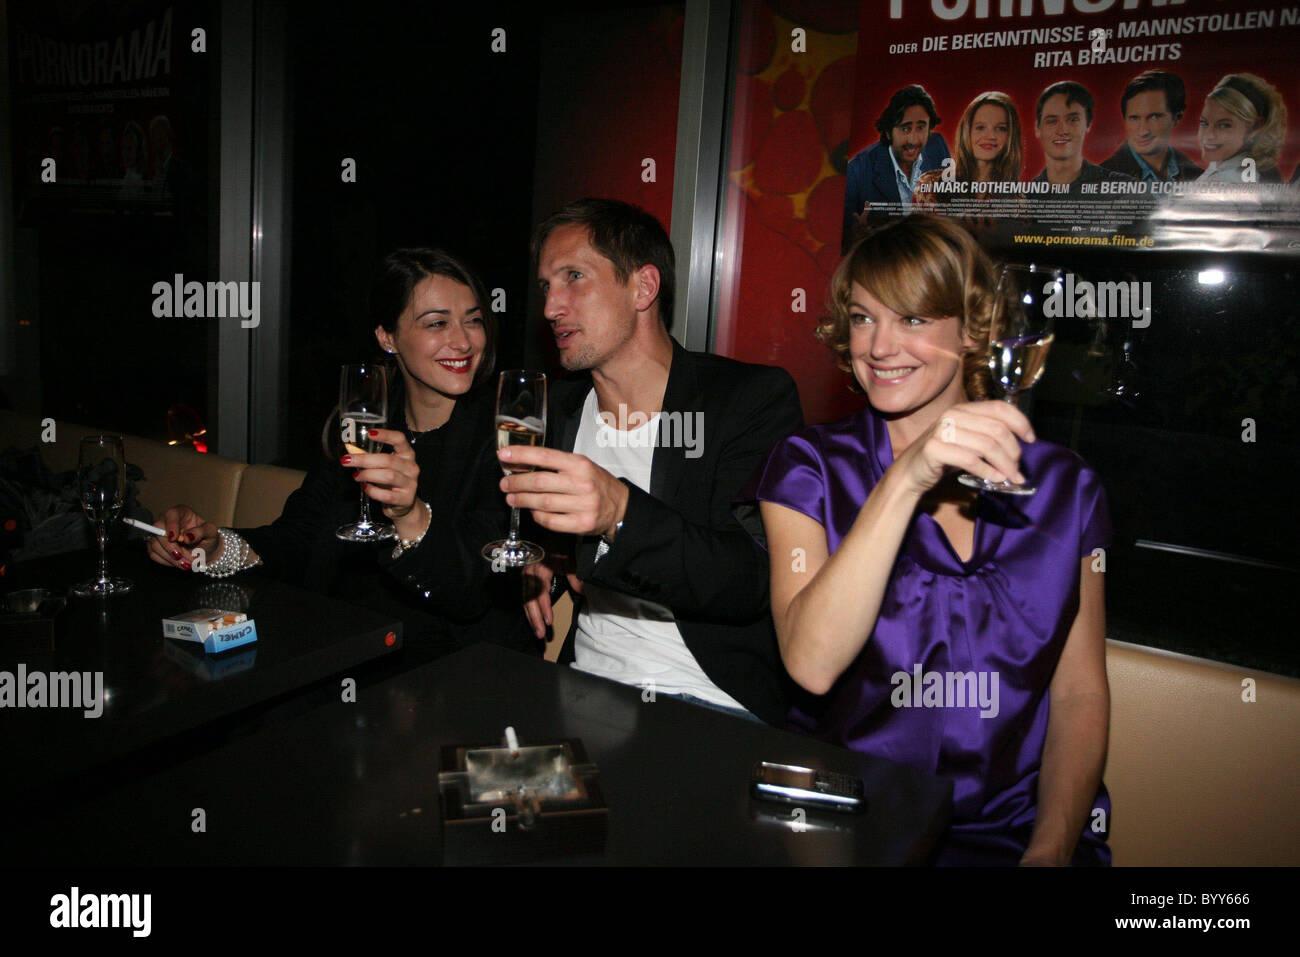 Valentina lodovini benno fuermann elke winkens pornorama stock photo royalty free image - Mobel maxx munchen ...